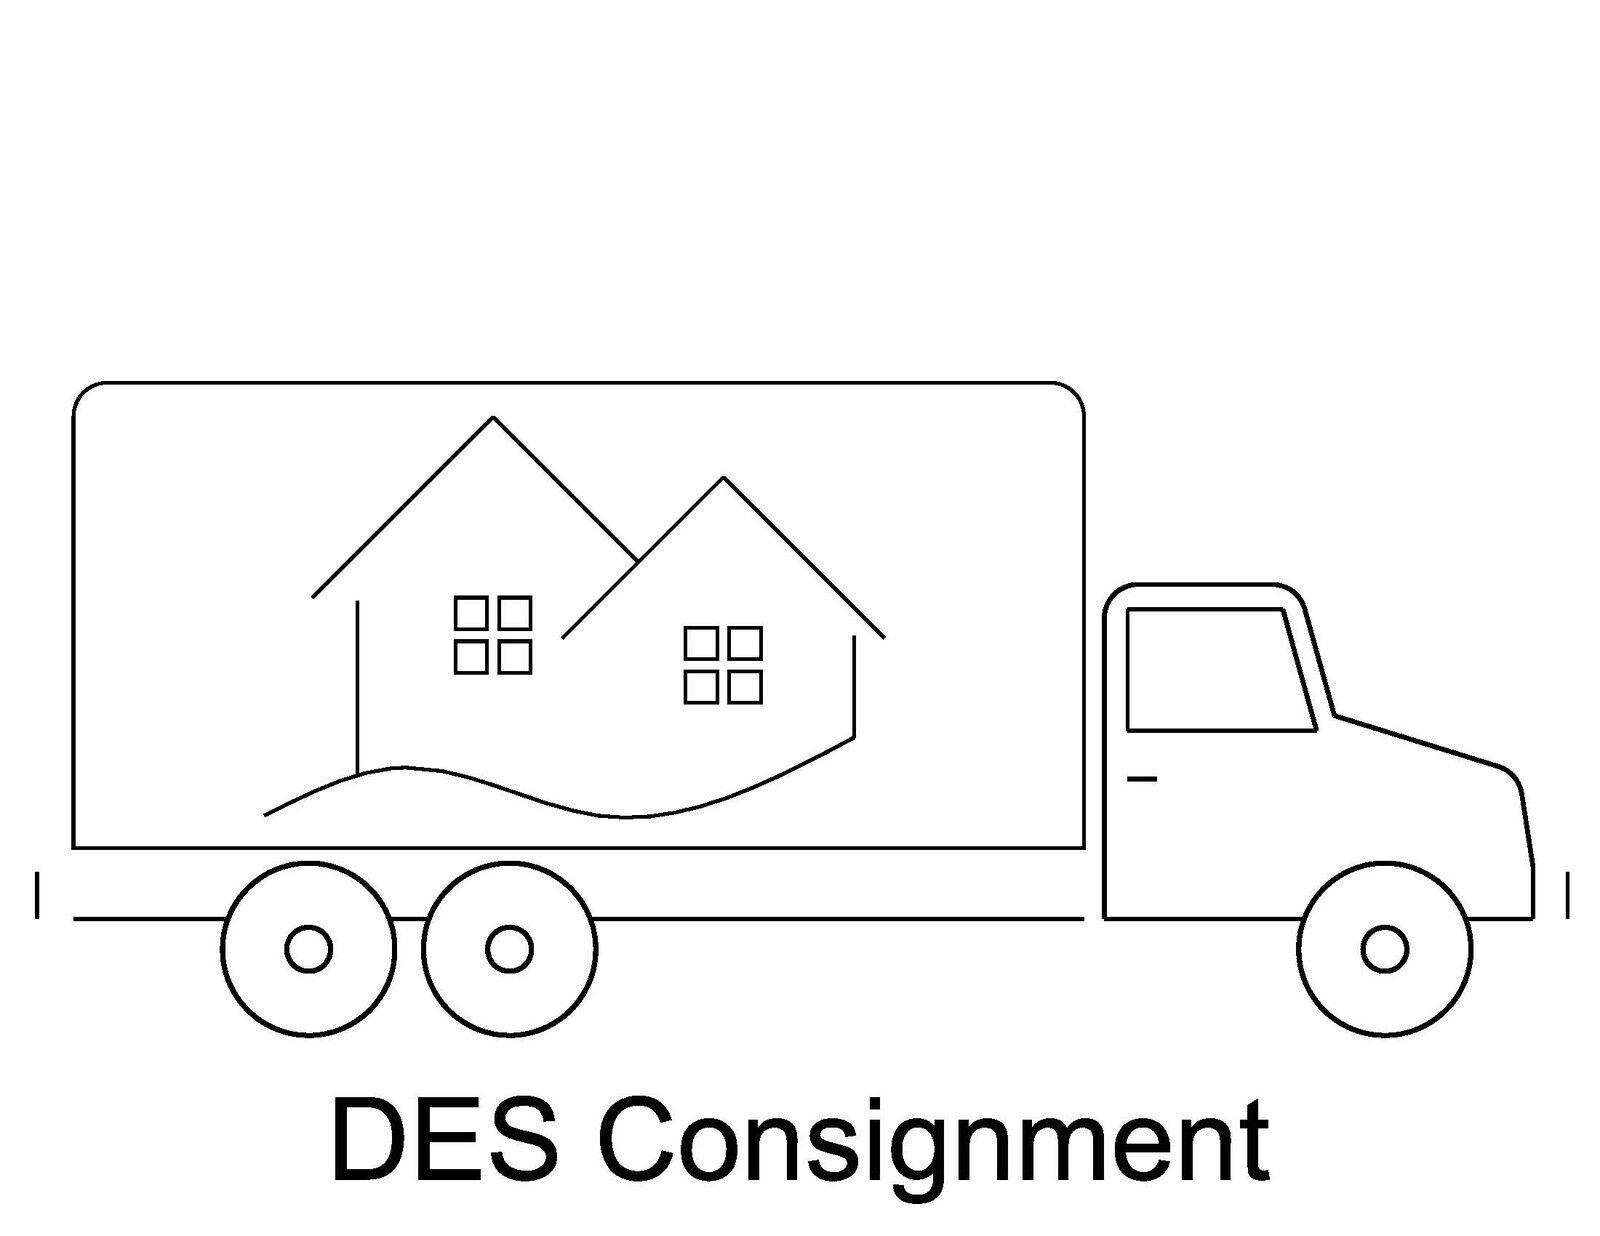 DES Consignment